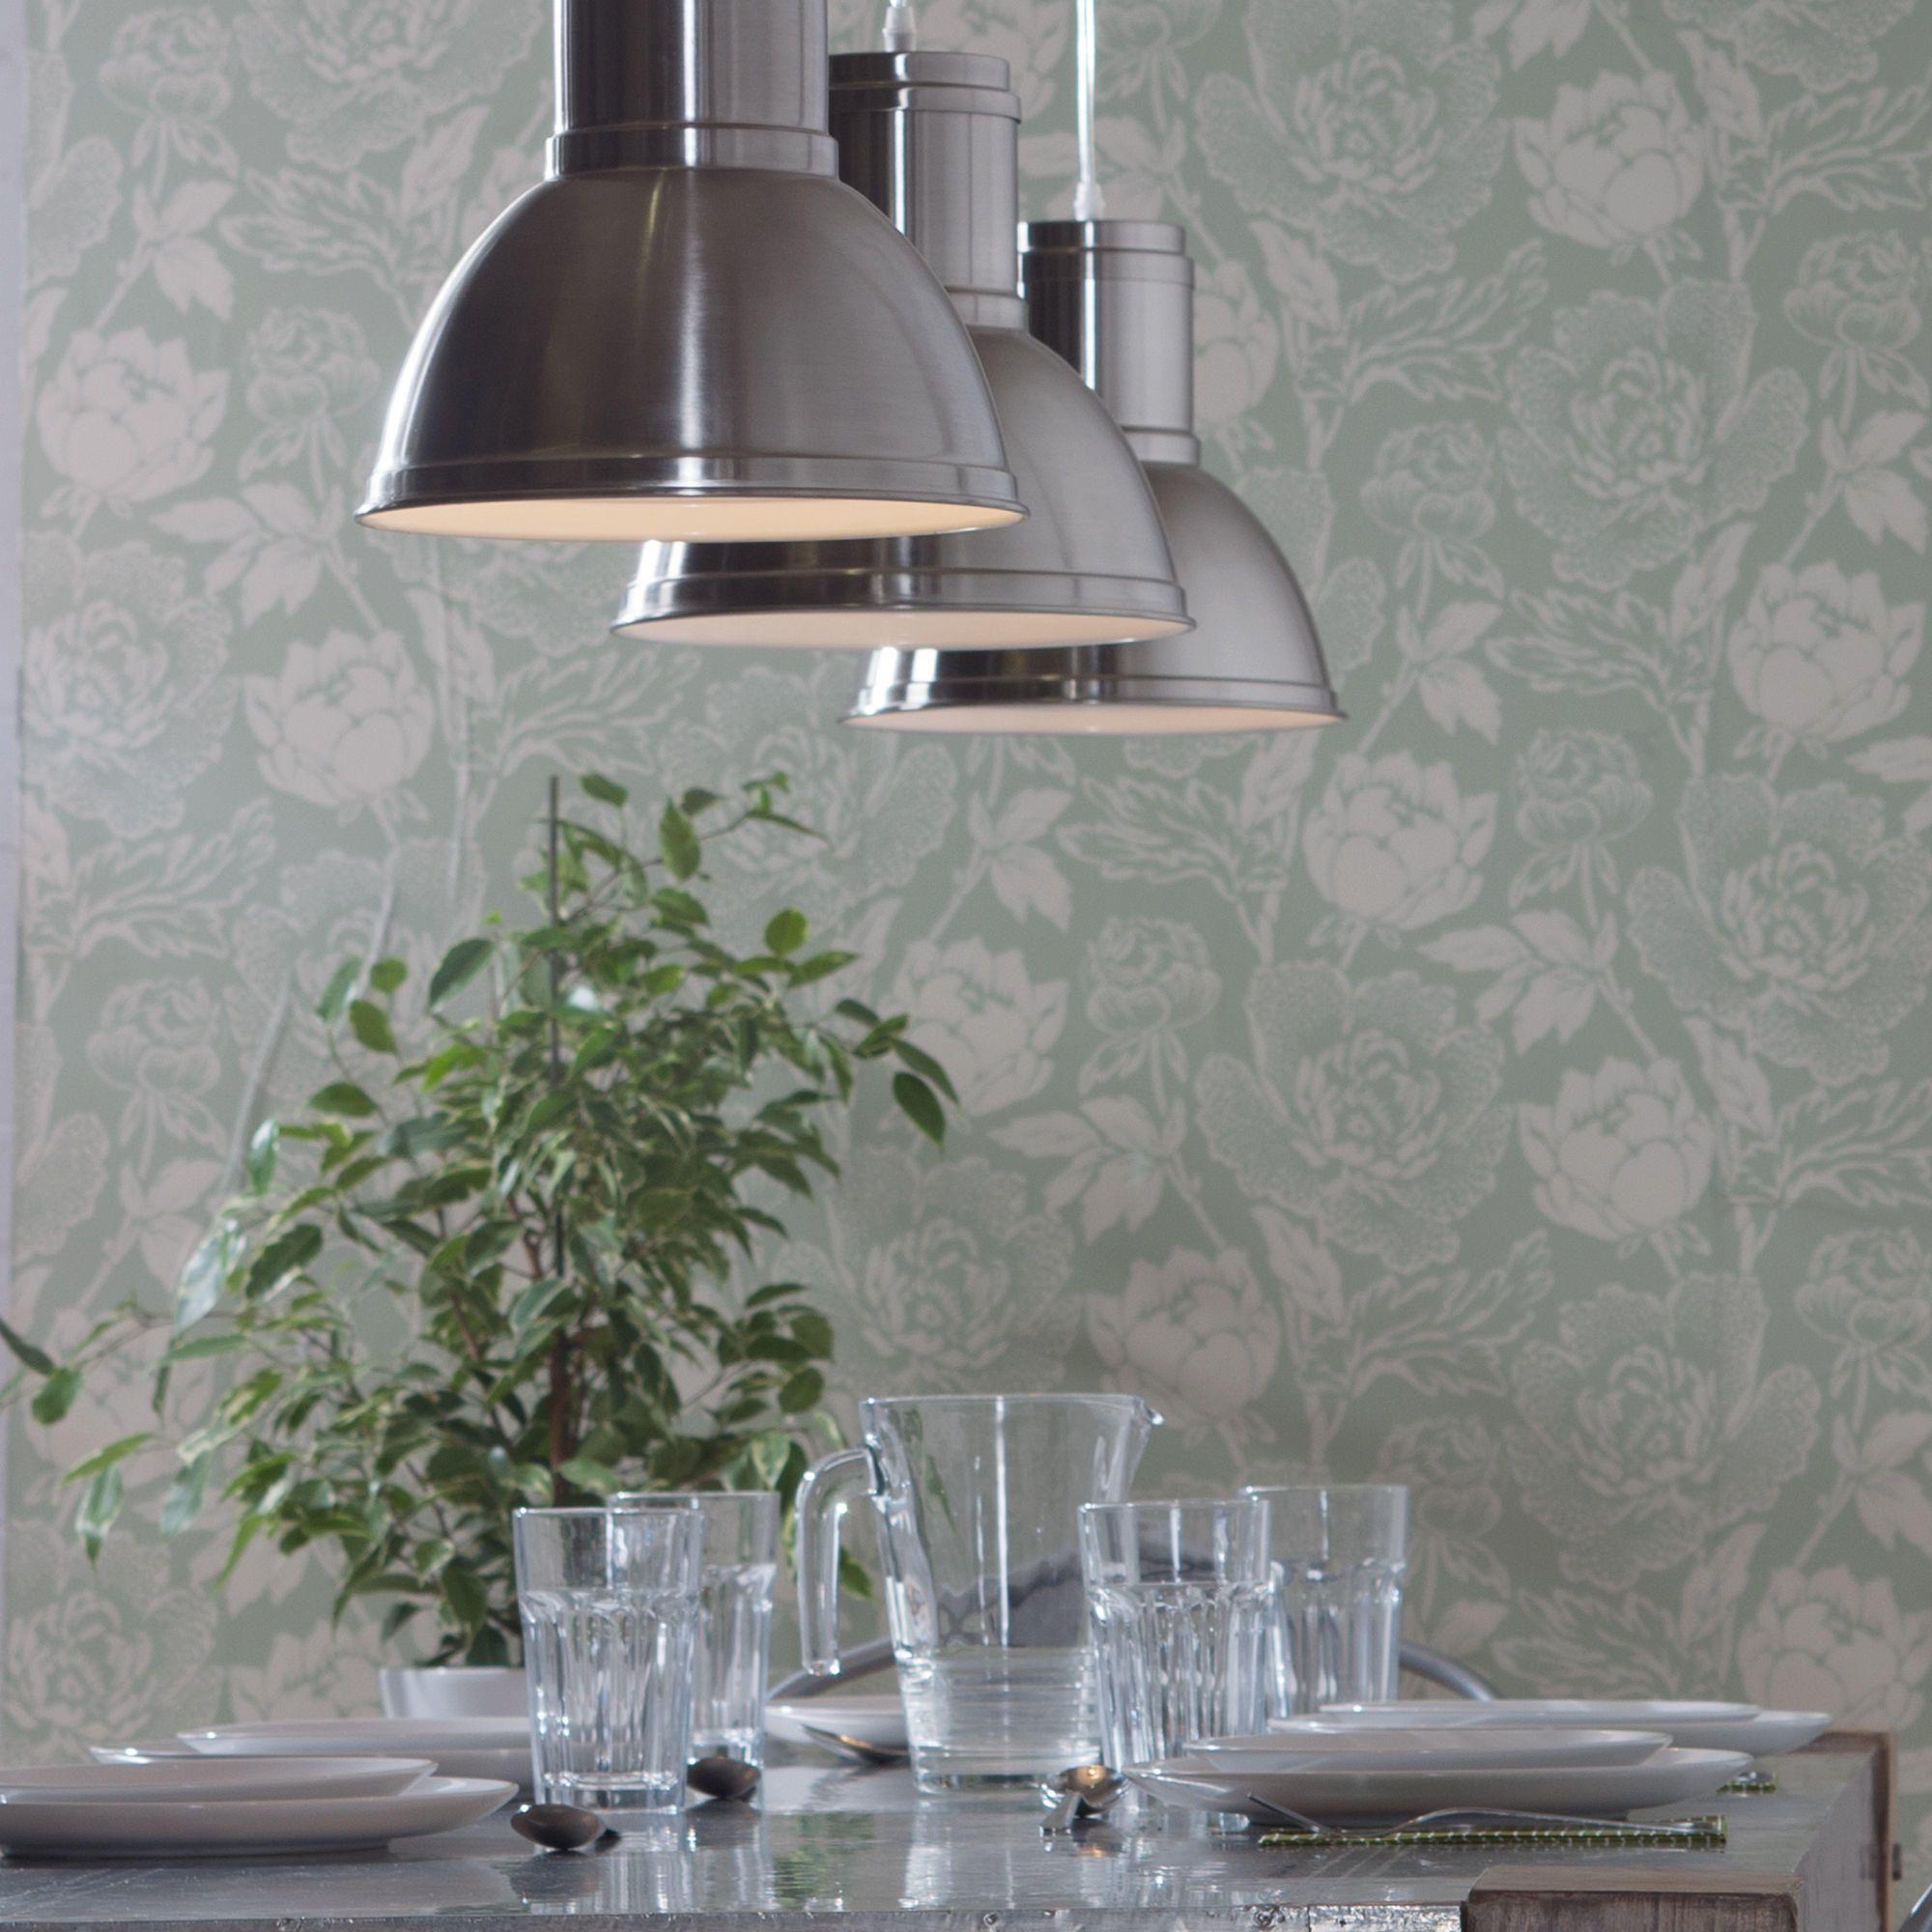 kitchen diner lighting. Light Kitchen Diner Lighting L